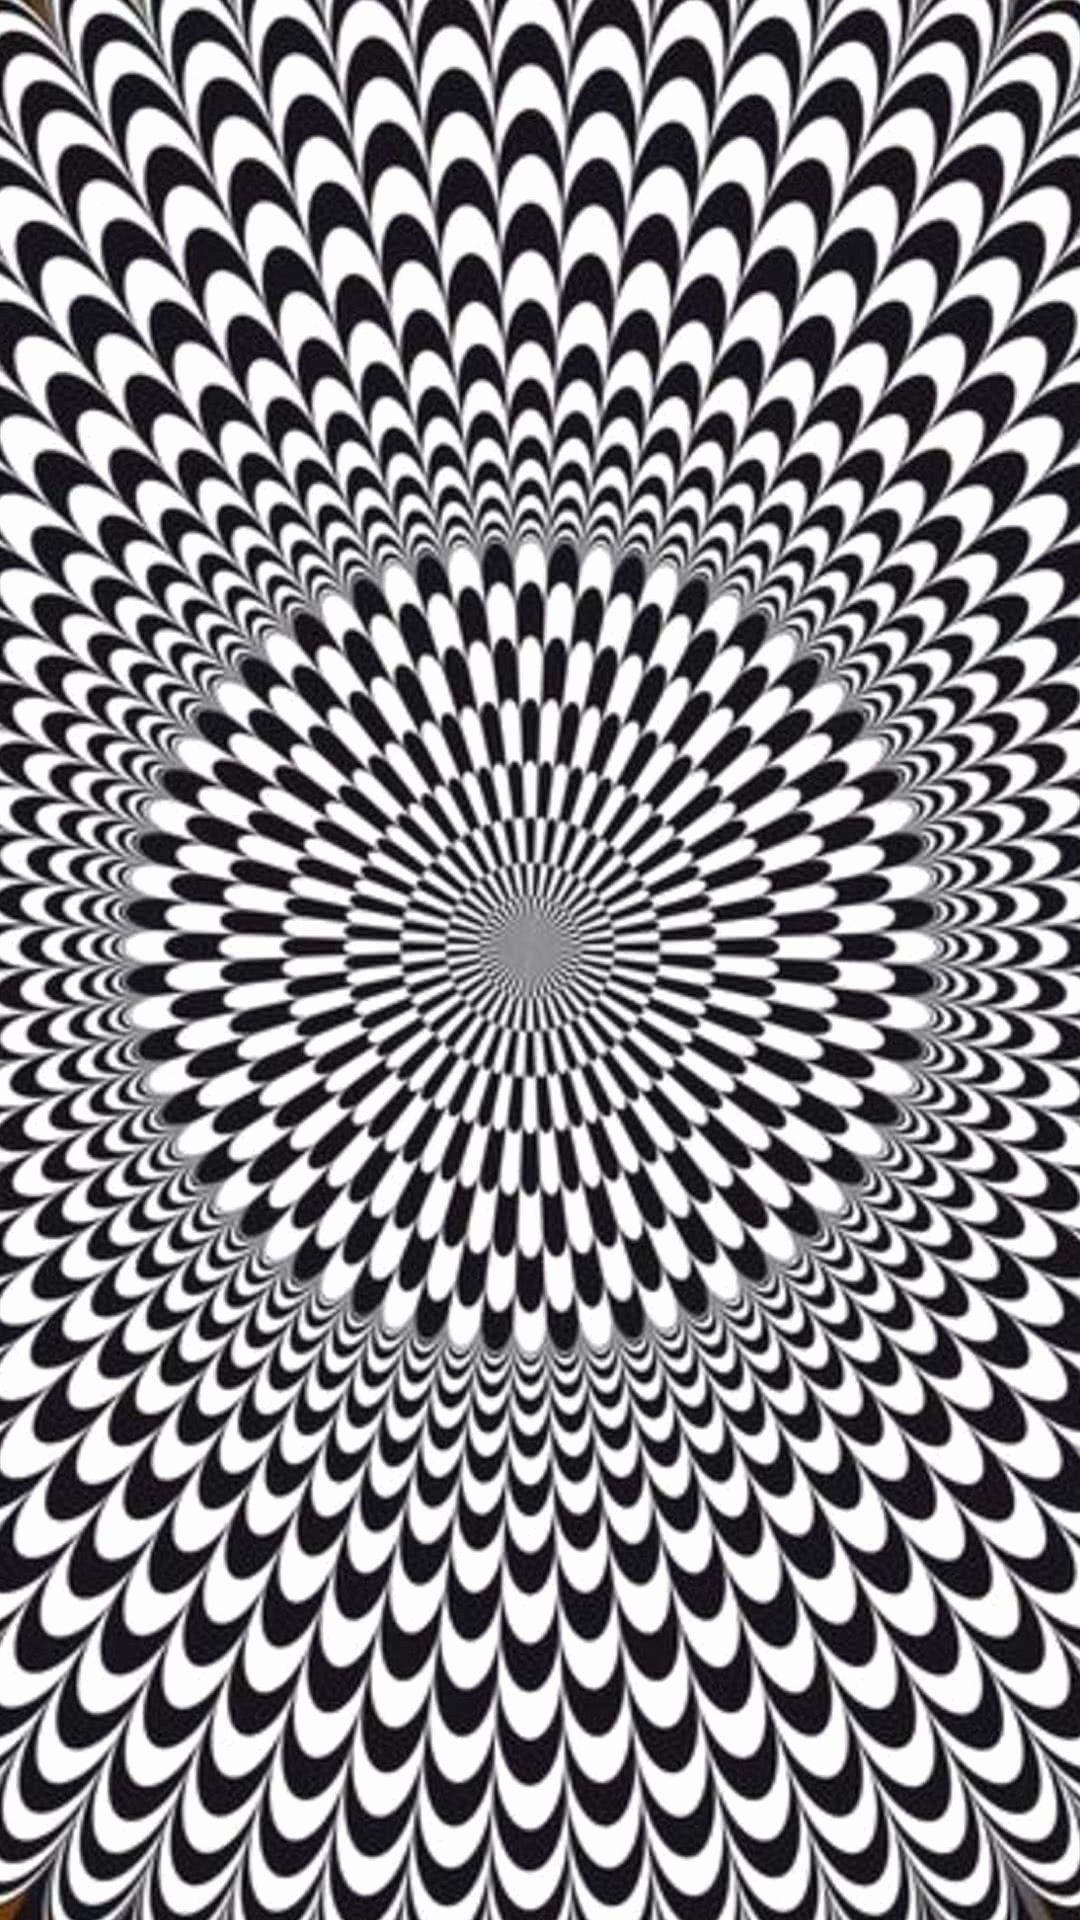 Pin By Hem Raj Sharma On Color In 2020 Optical Illusions Pictures Optical Illusion Wallpaper Optical Illusions Art